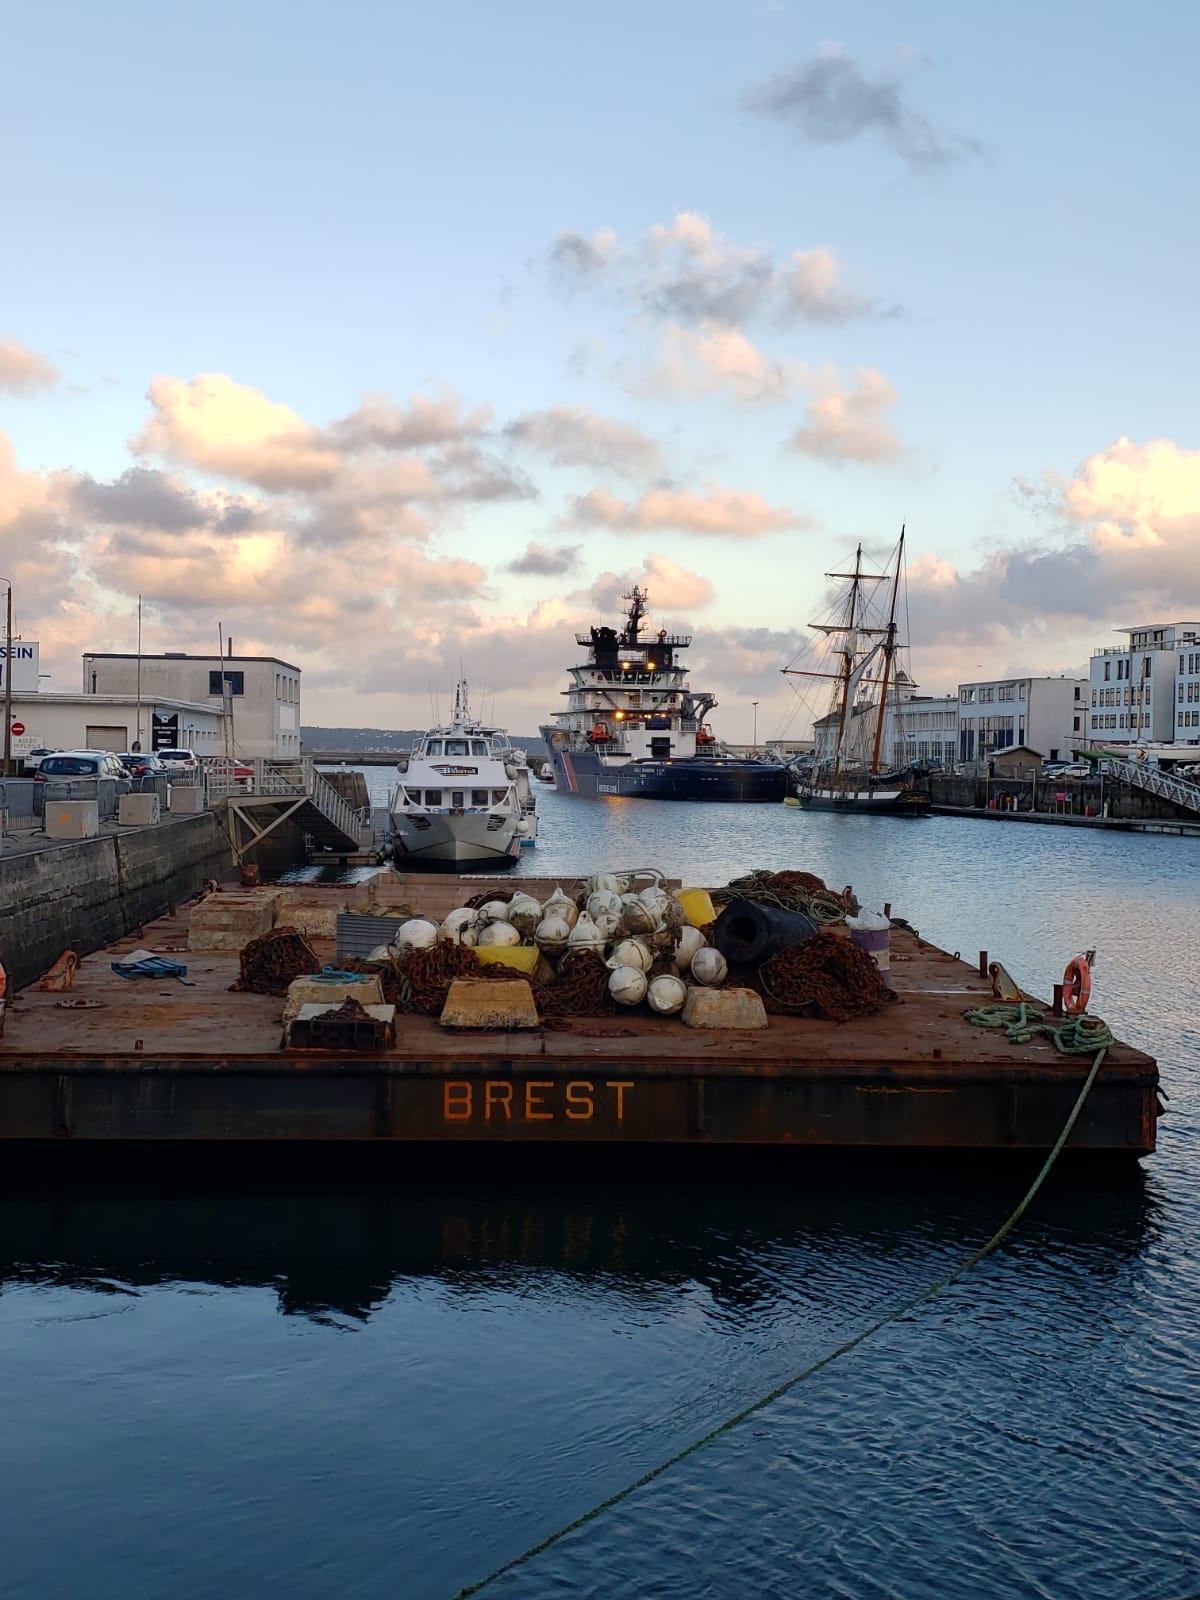 Future Ocean2 in Brest, France